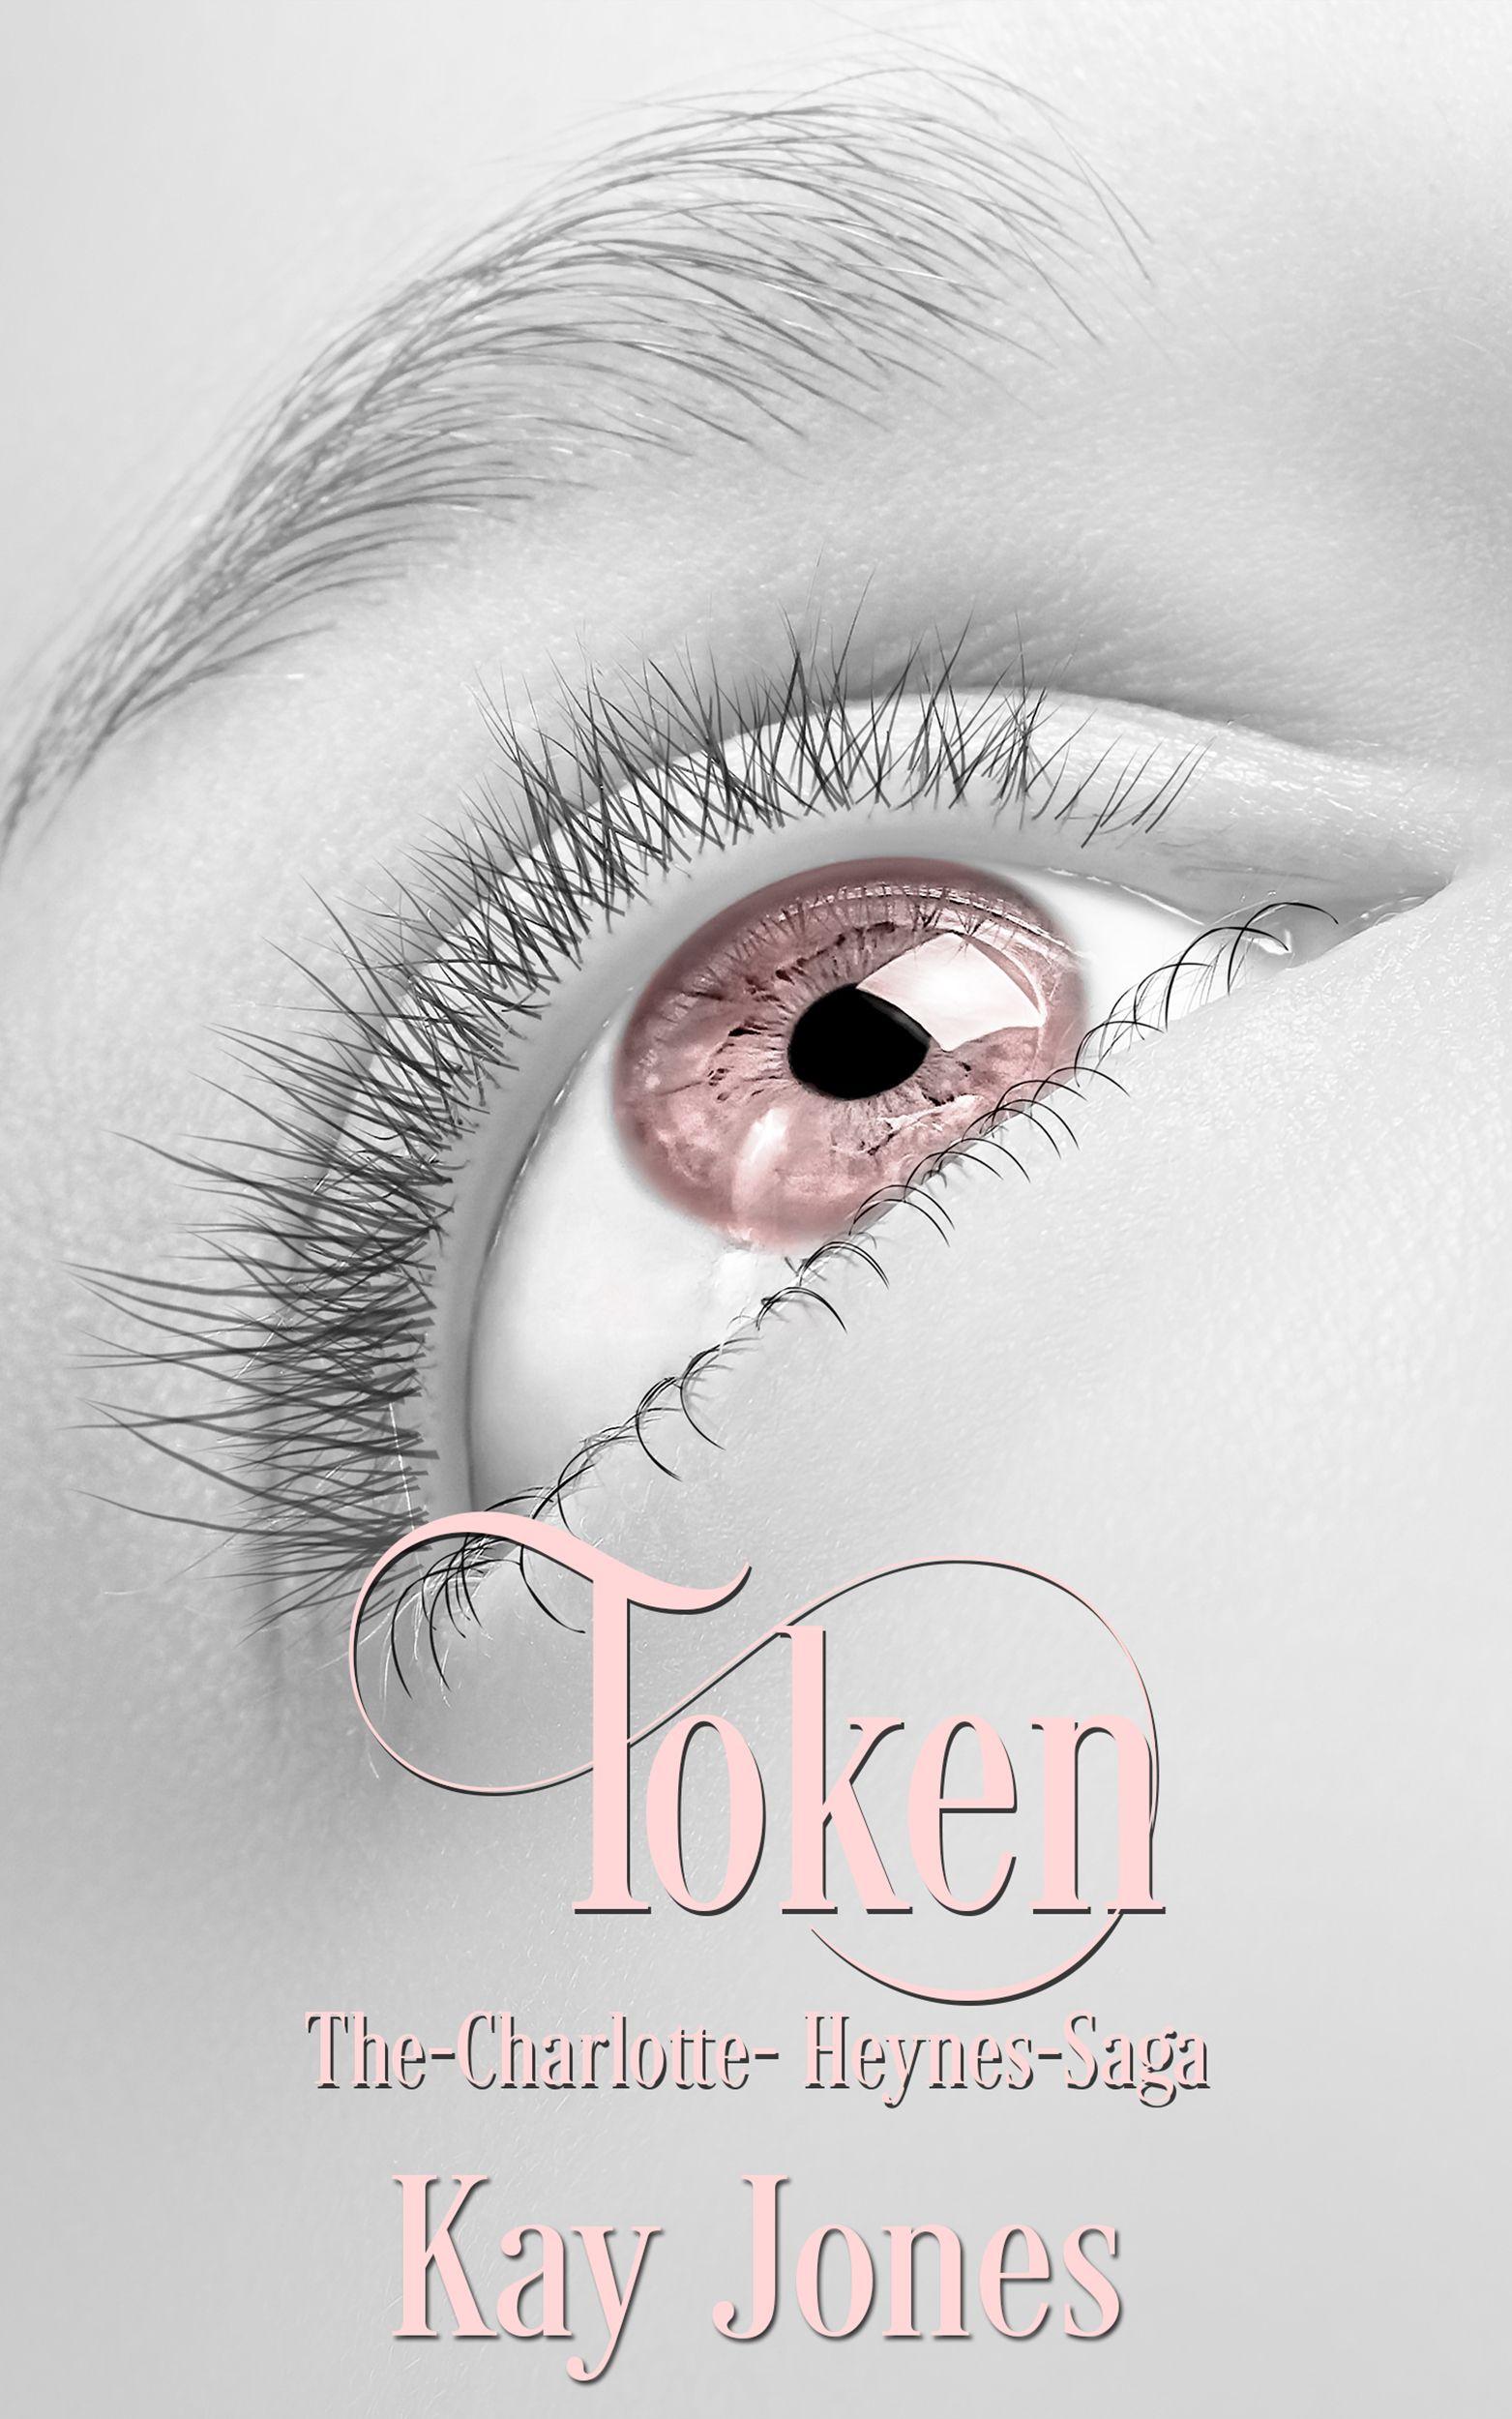 jpg-kindle-cover-token-2